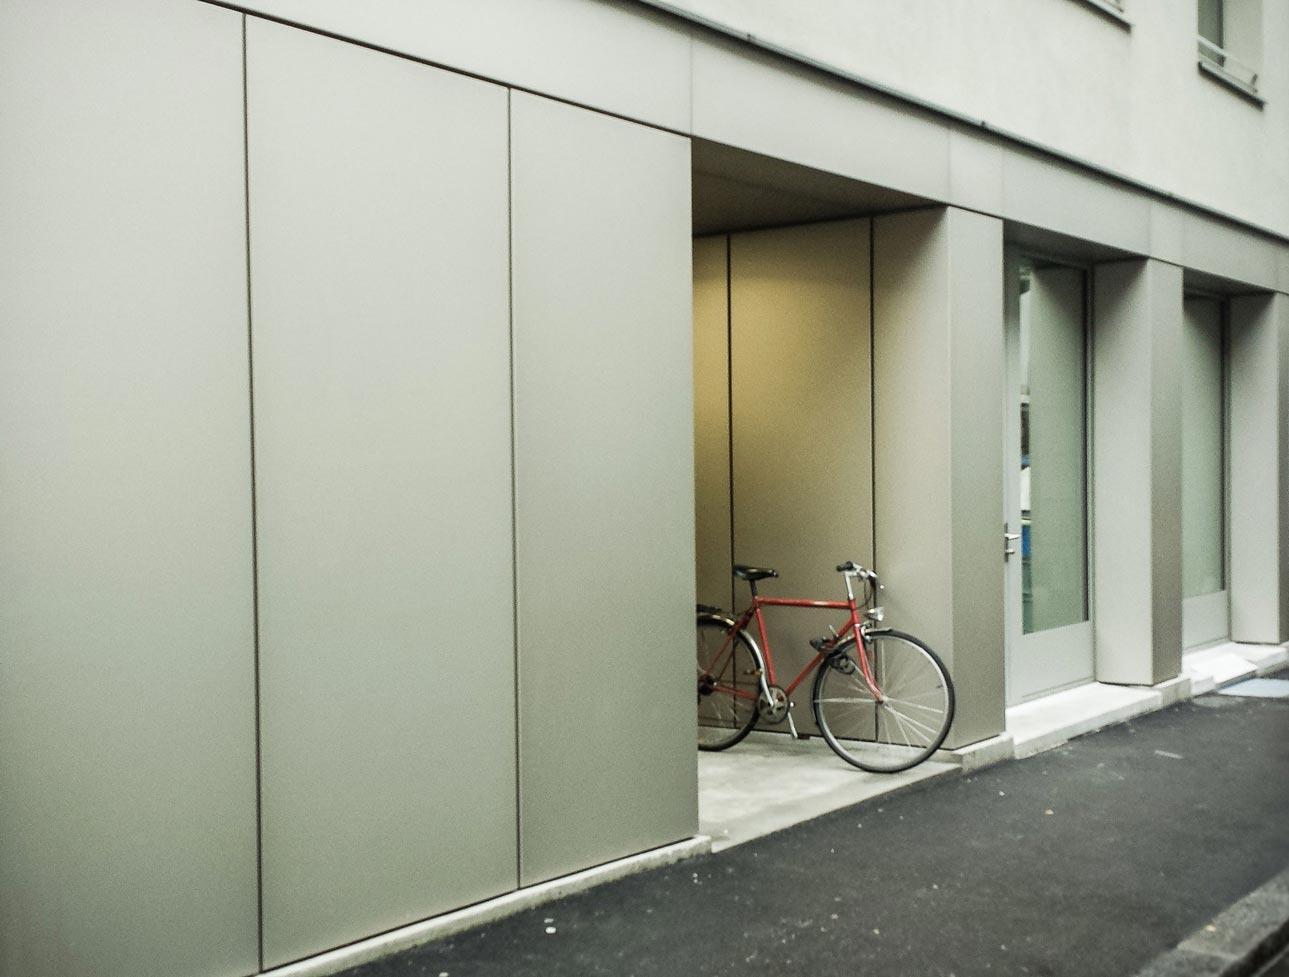 Habillage de façade en aluminium éloxé